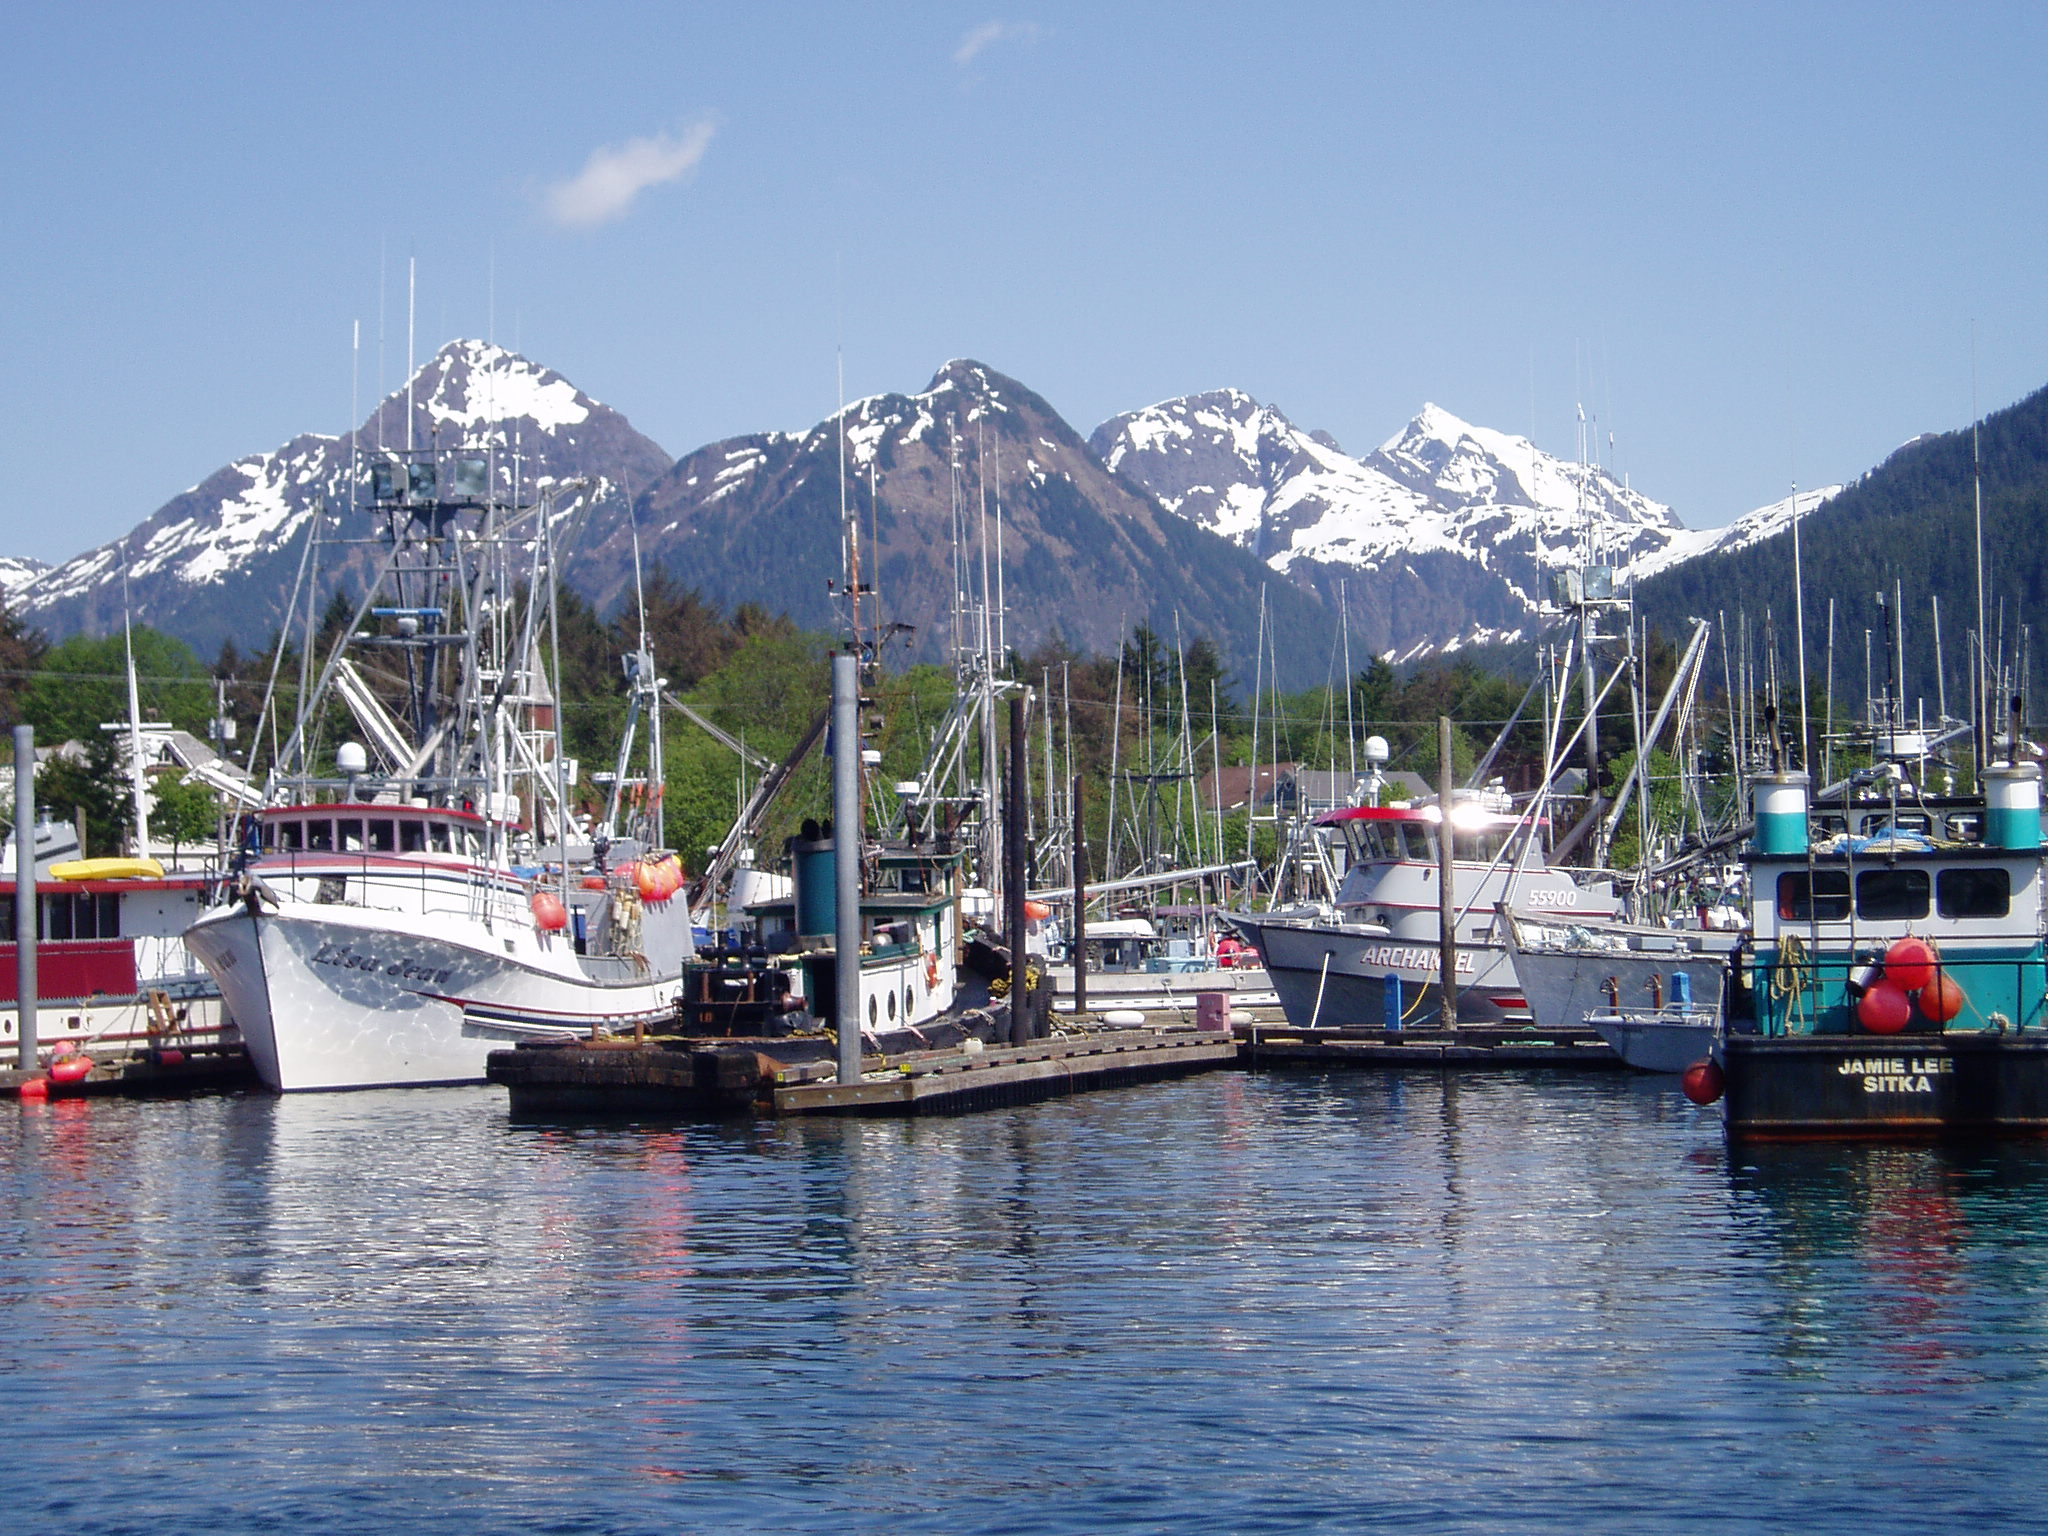 Abraham-Hicks Alaska 2010